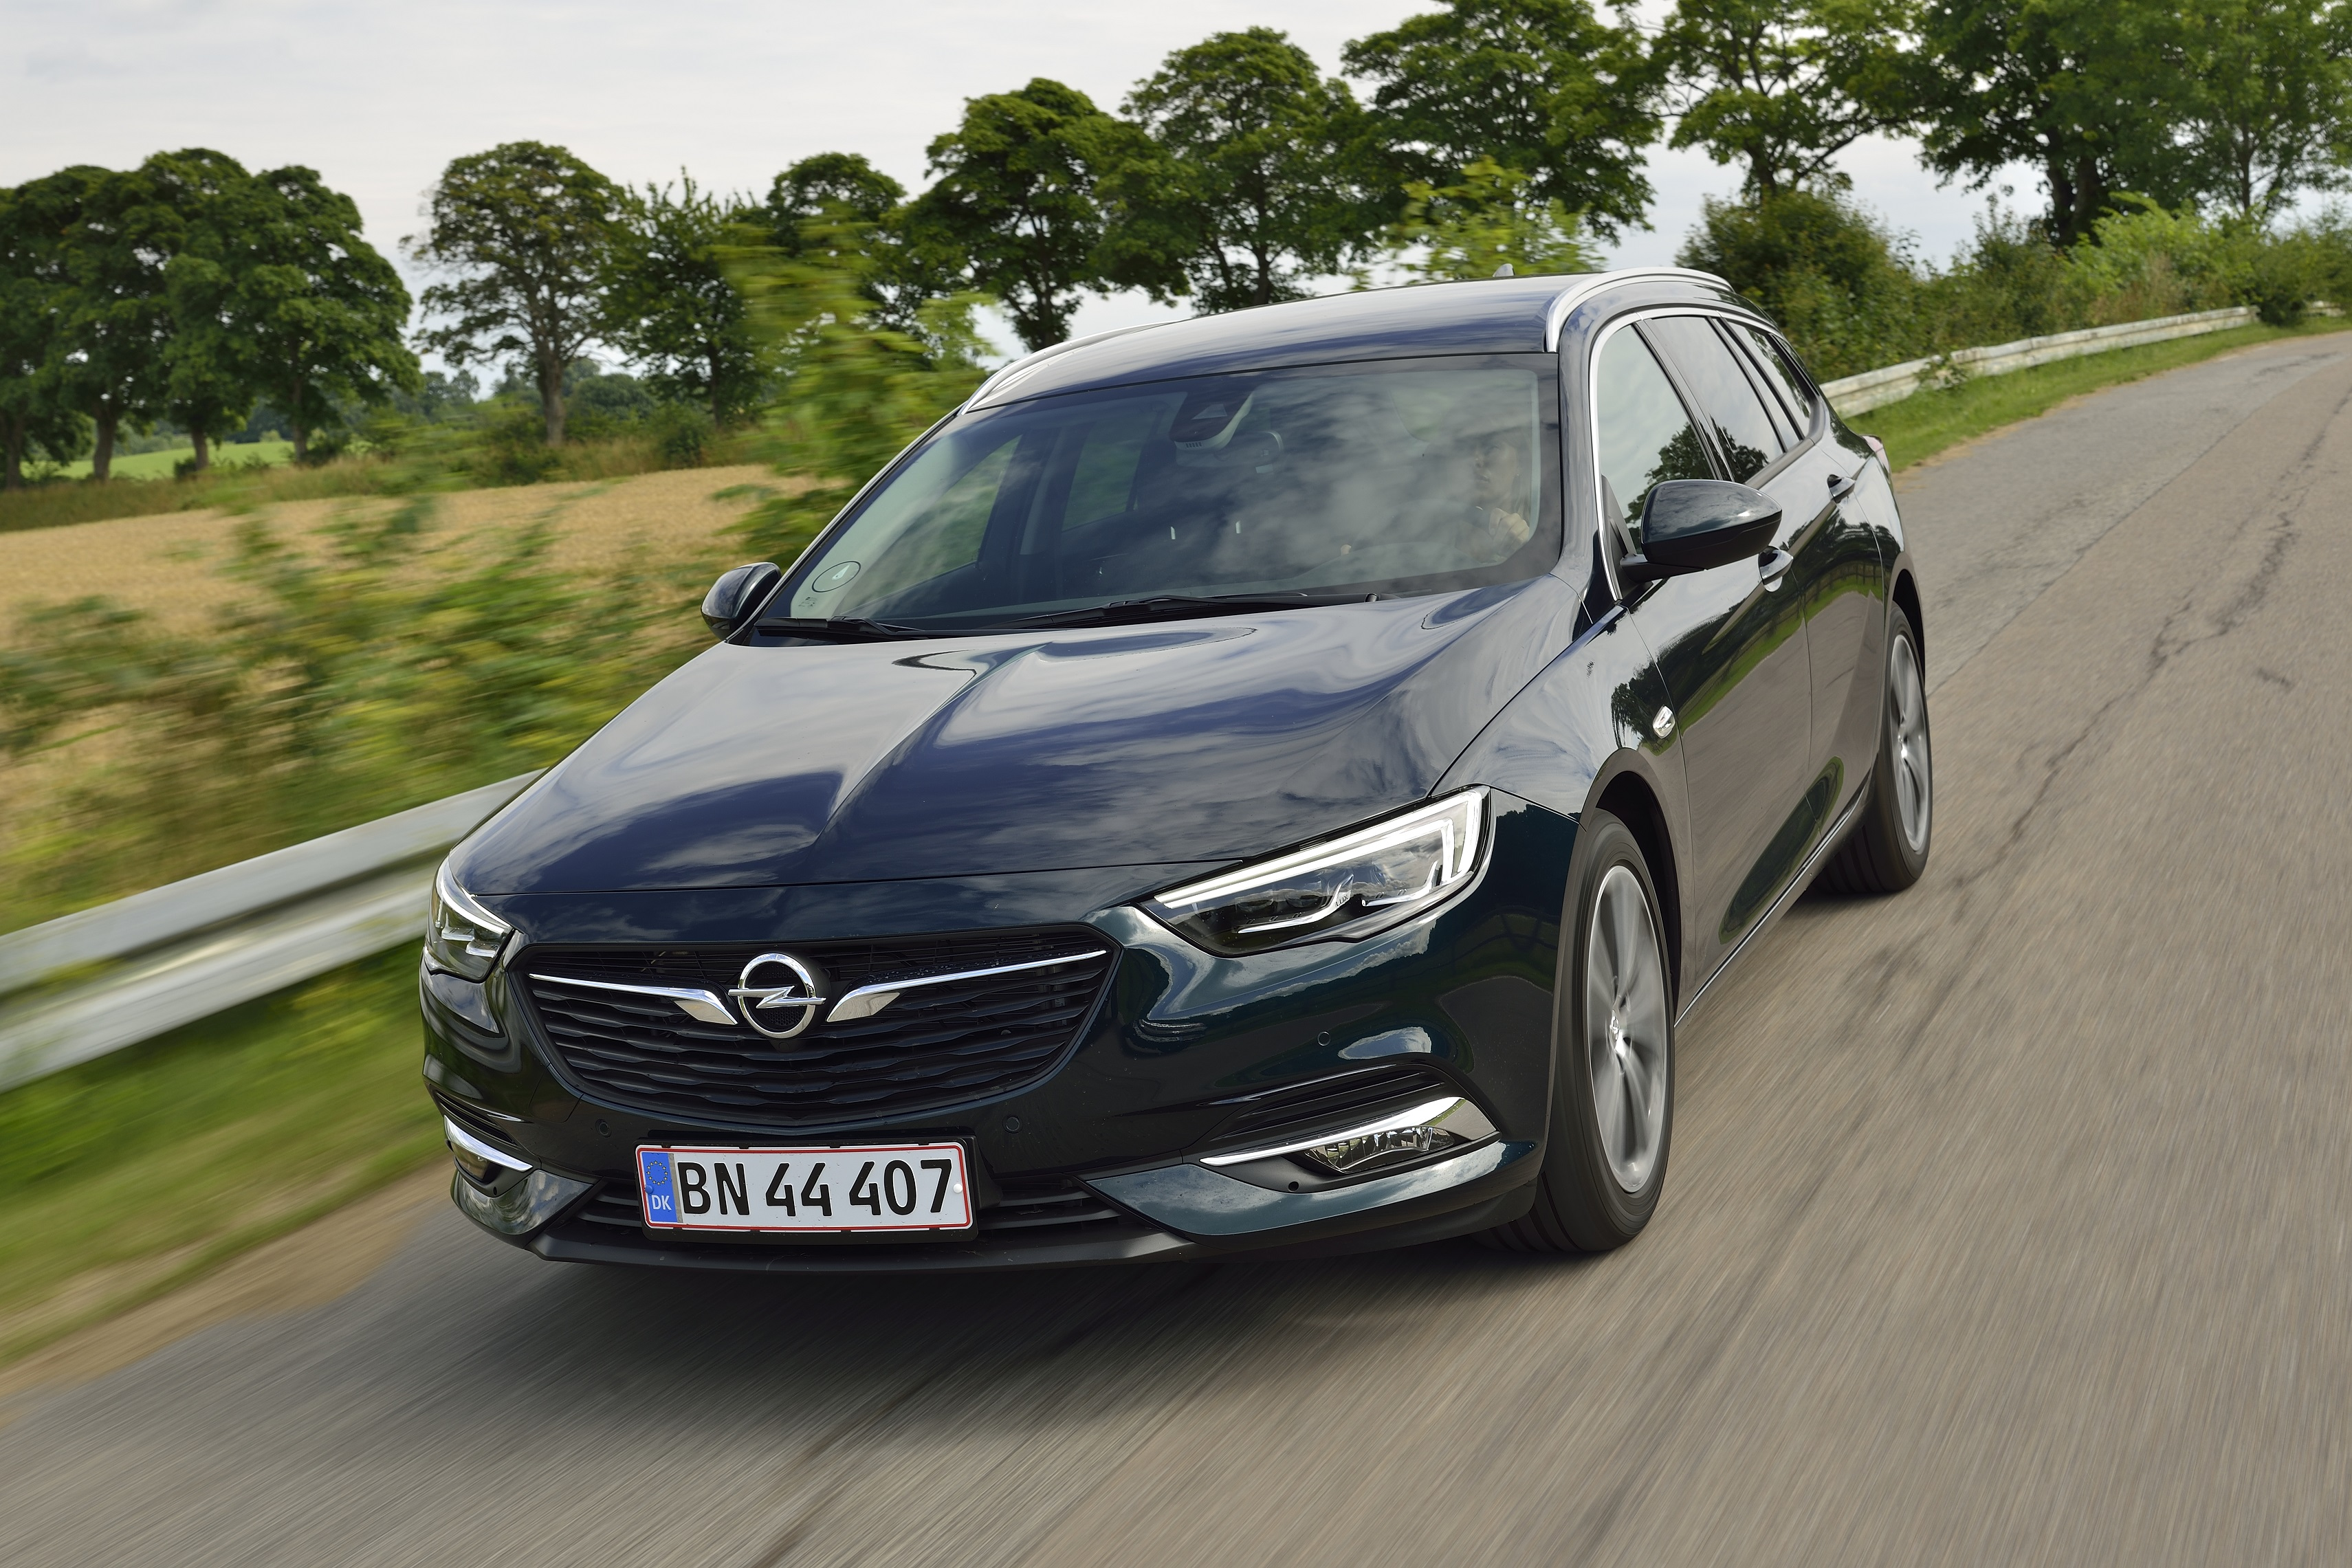 Opel nye storsællert rammer 100.000